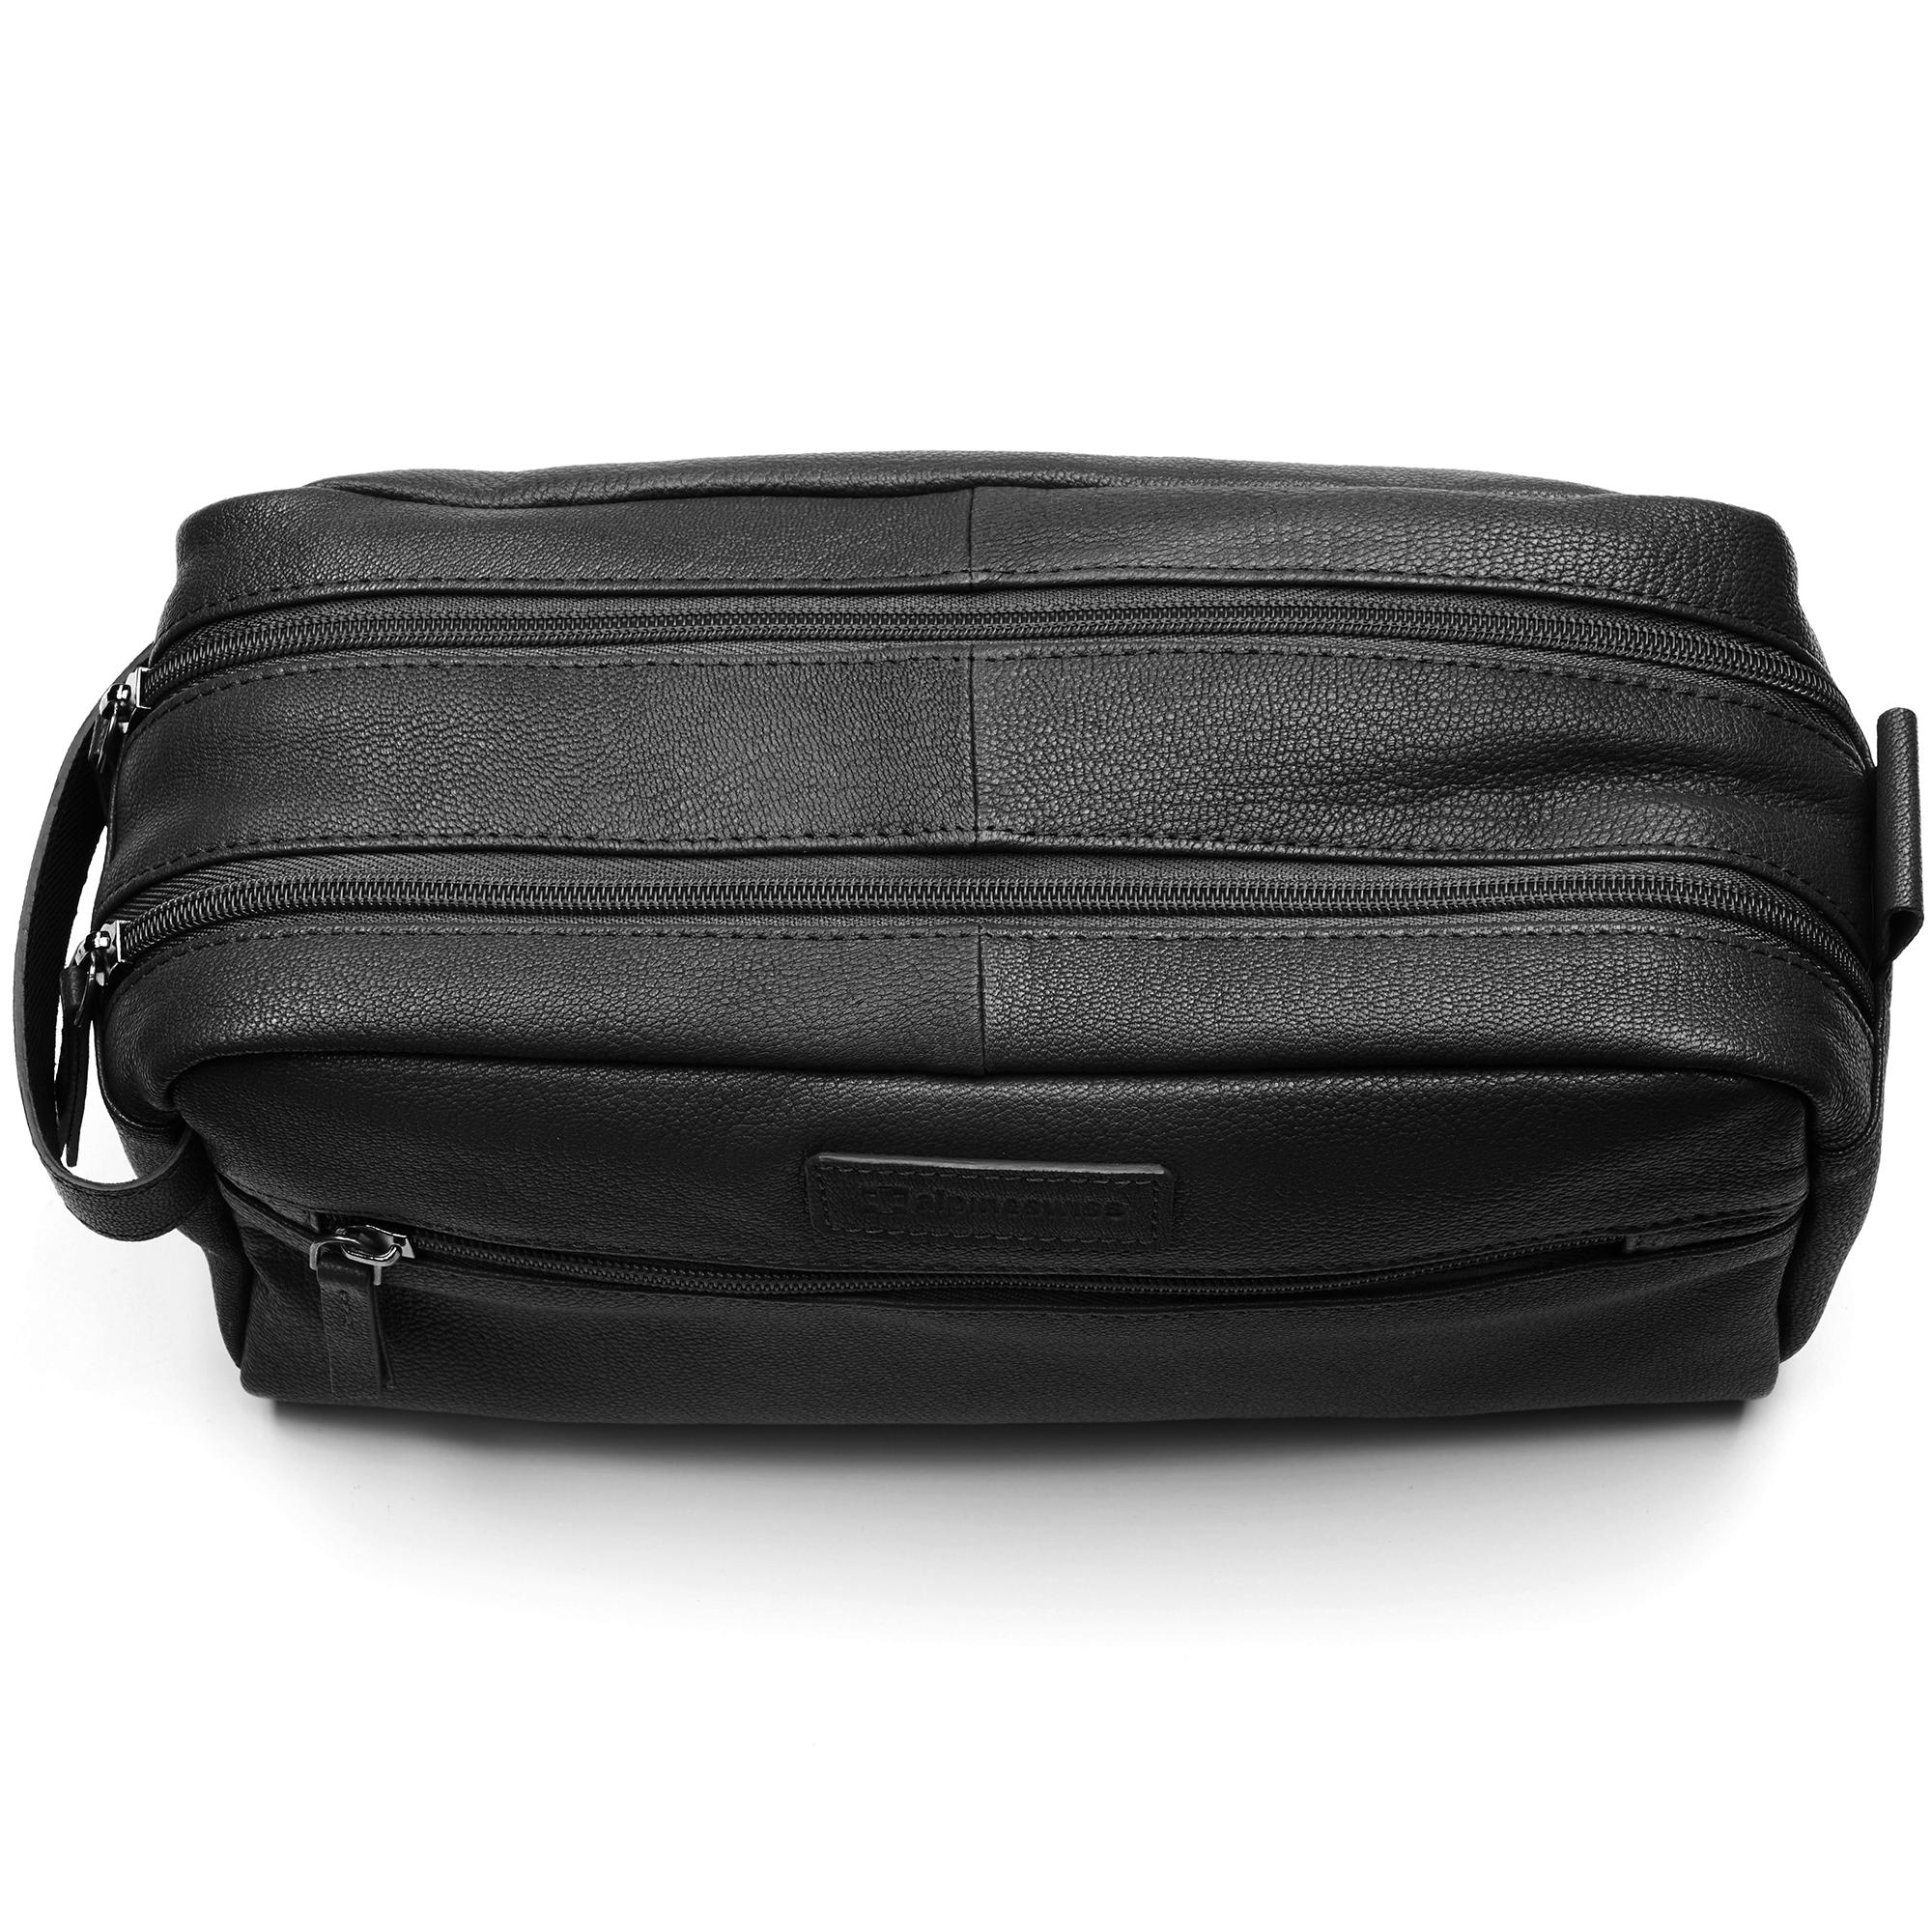 AlpineSwiss-Sedona-Toiletry-Bag-Genuine-Leather-Shaving-Kit-Dopp-Kit-Travel-Case thumbnail 14